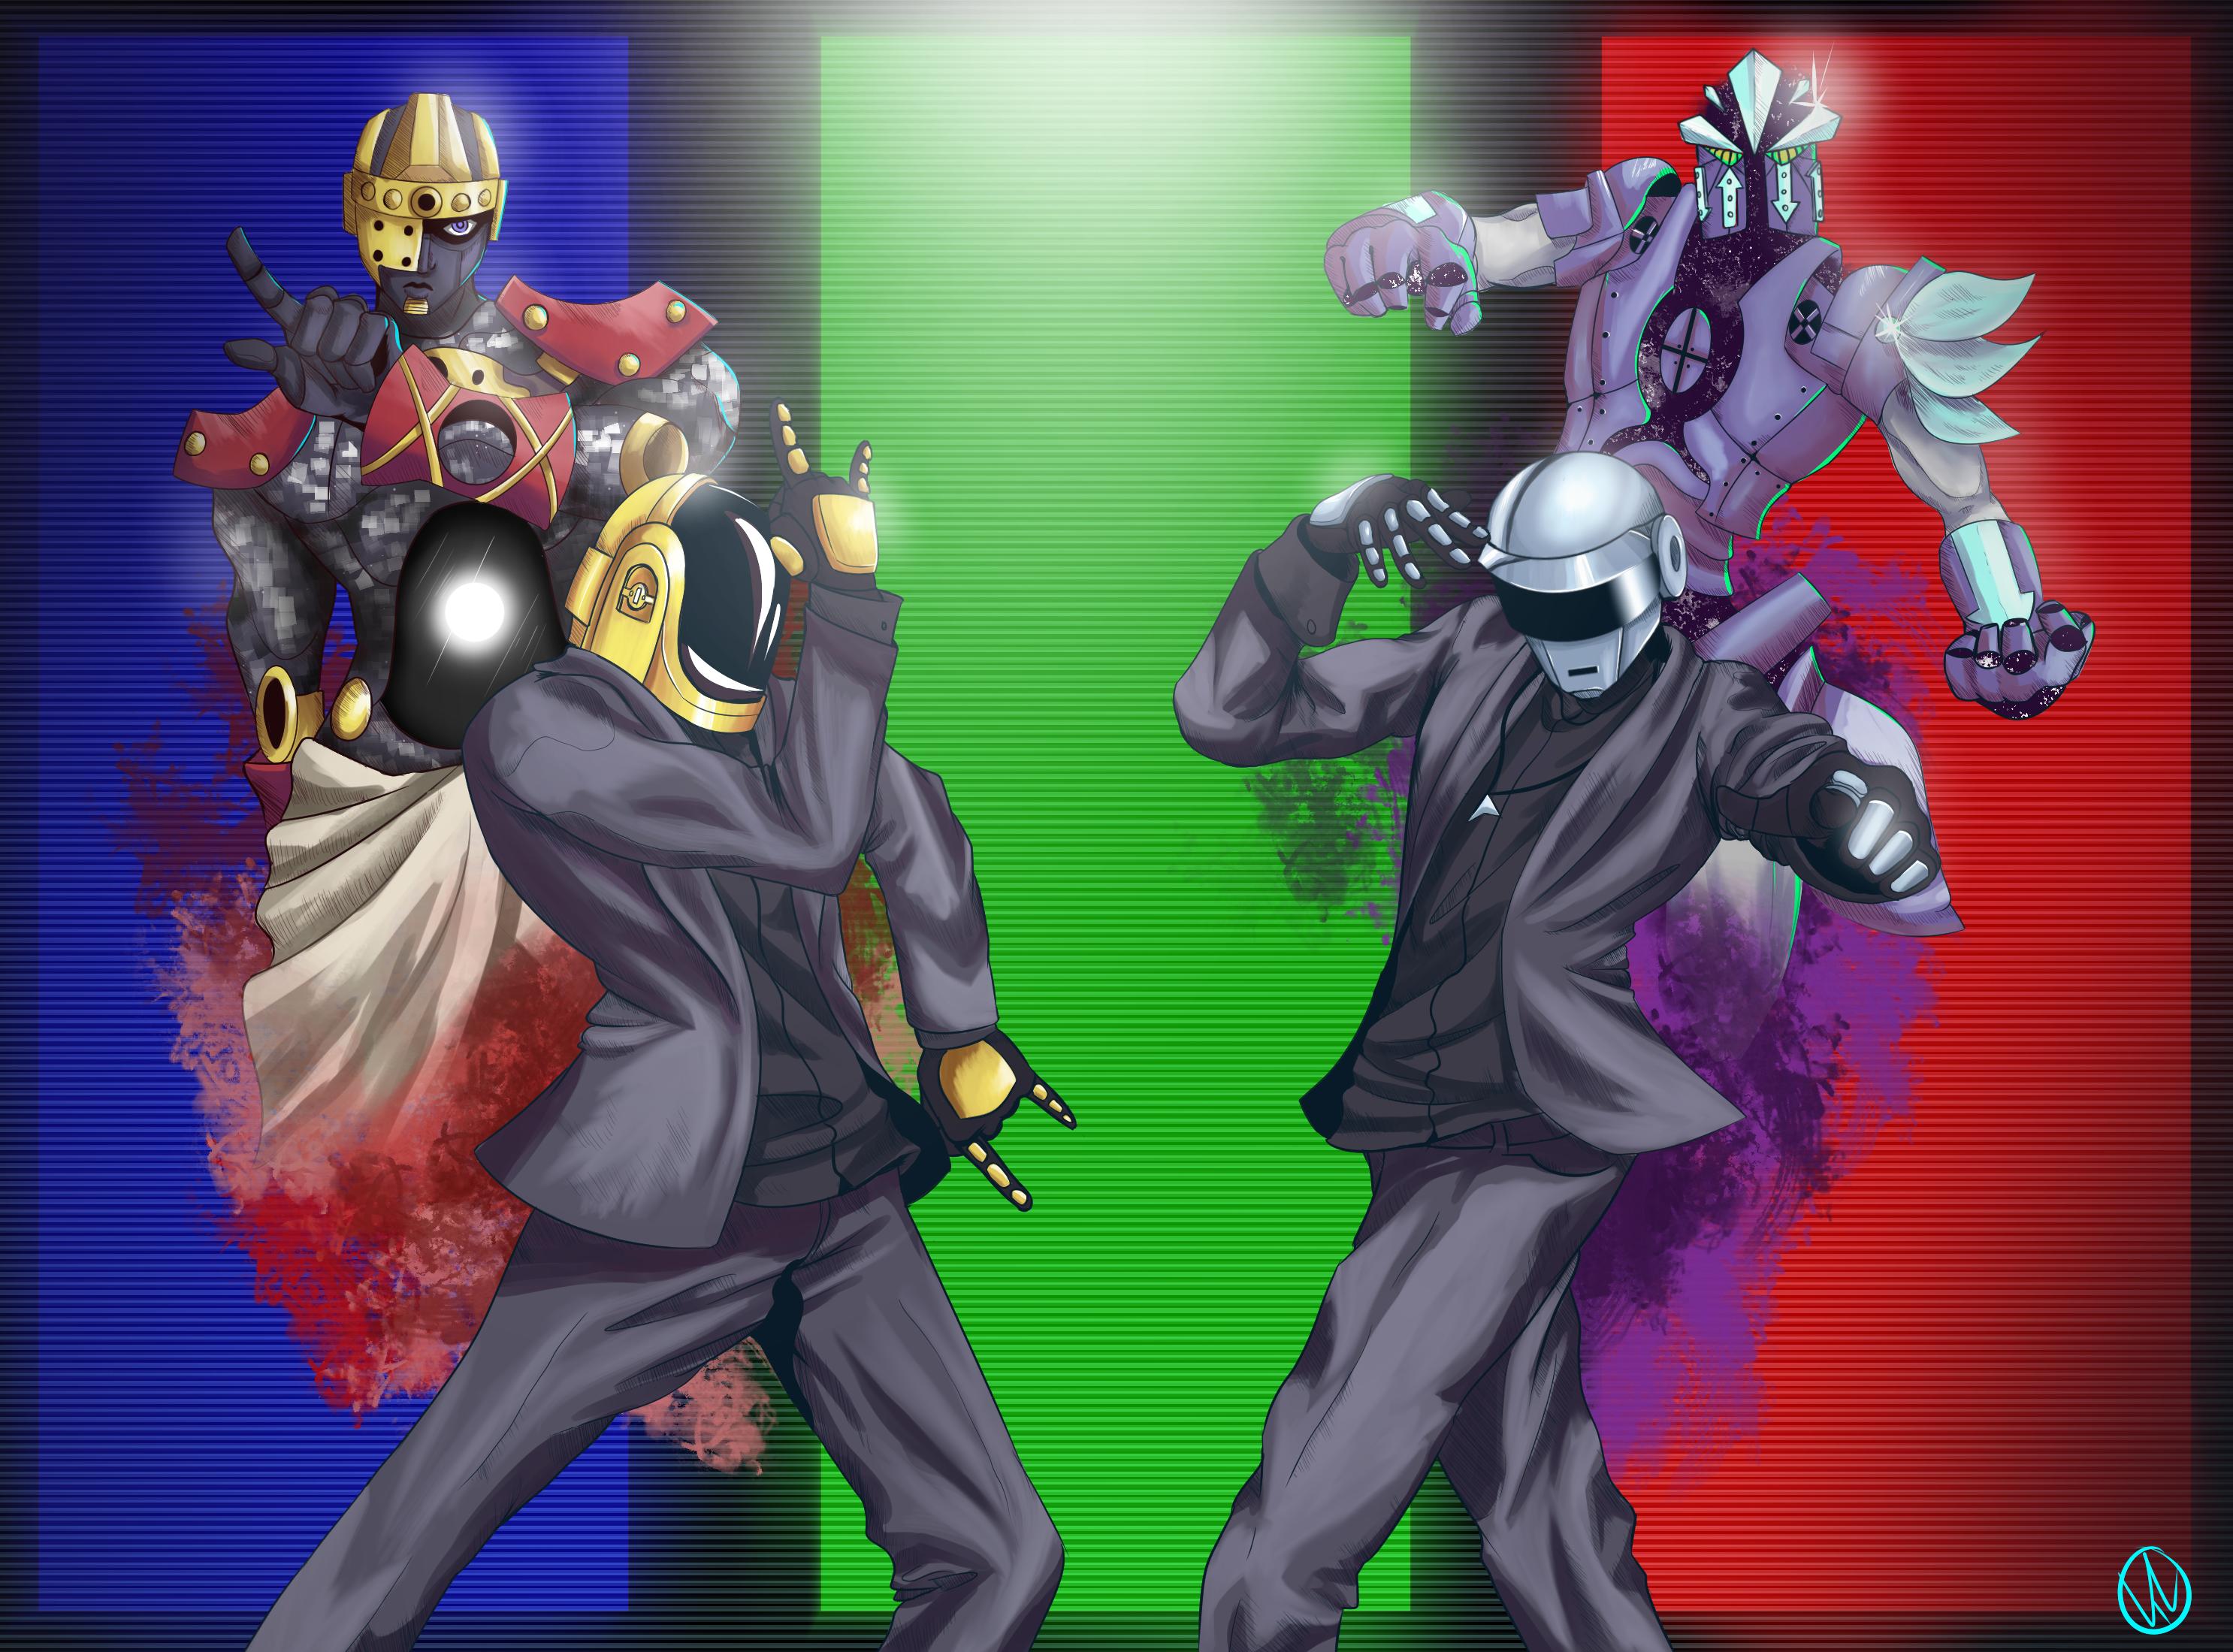 JOJO and Daft Punk